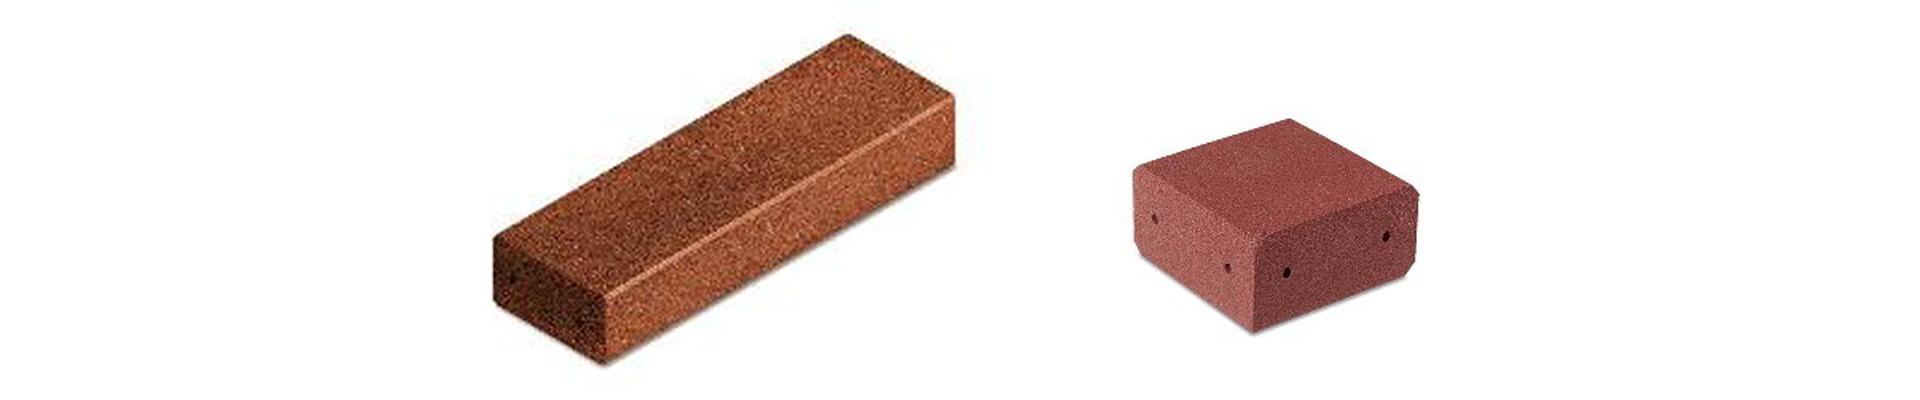 Ph Gummitechnik Blockstufe